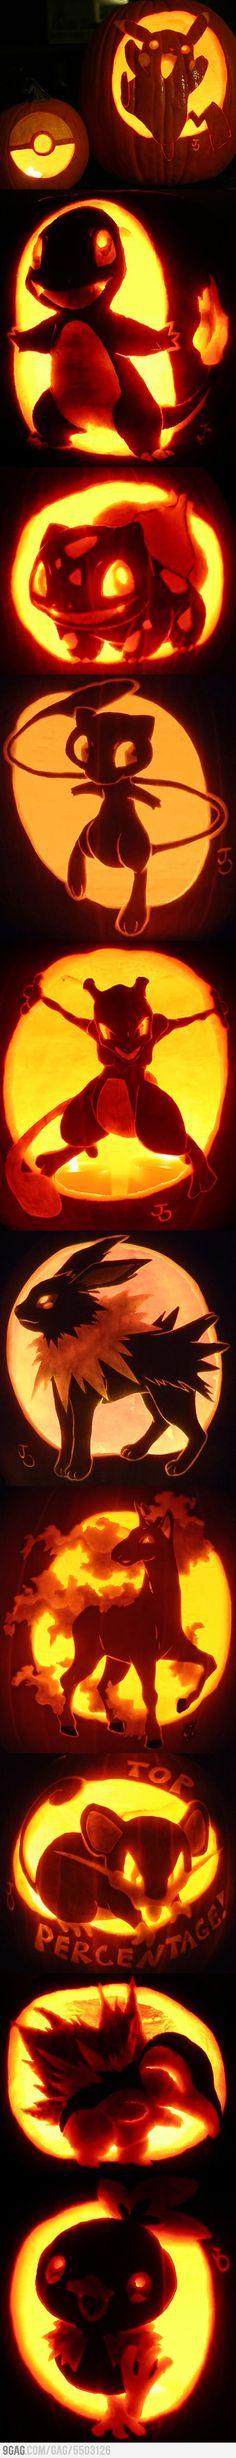 Pokemon Jack-O'-Lantern Pumpkin Art  your dad wants sawyer to be art oriented? @Remington Guest Guest Guest Schieffer